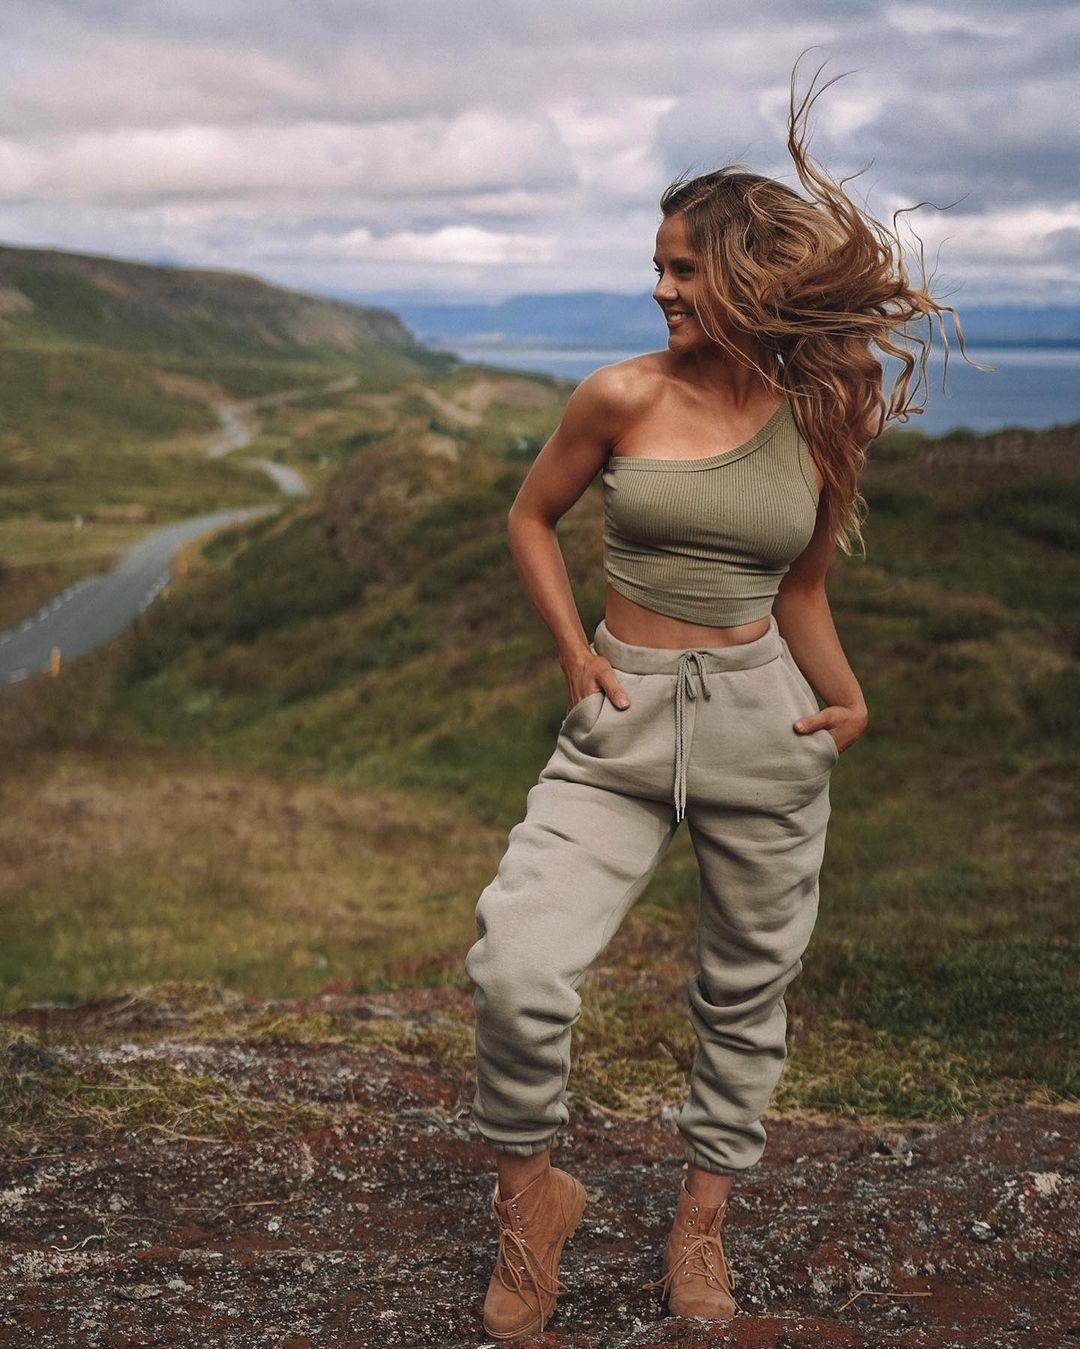 Dominique-Asgeirsdottir-Wallpapers-Insta-Fit-Bio-14